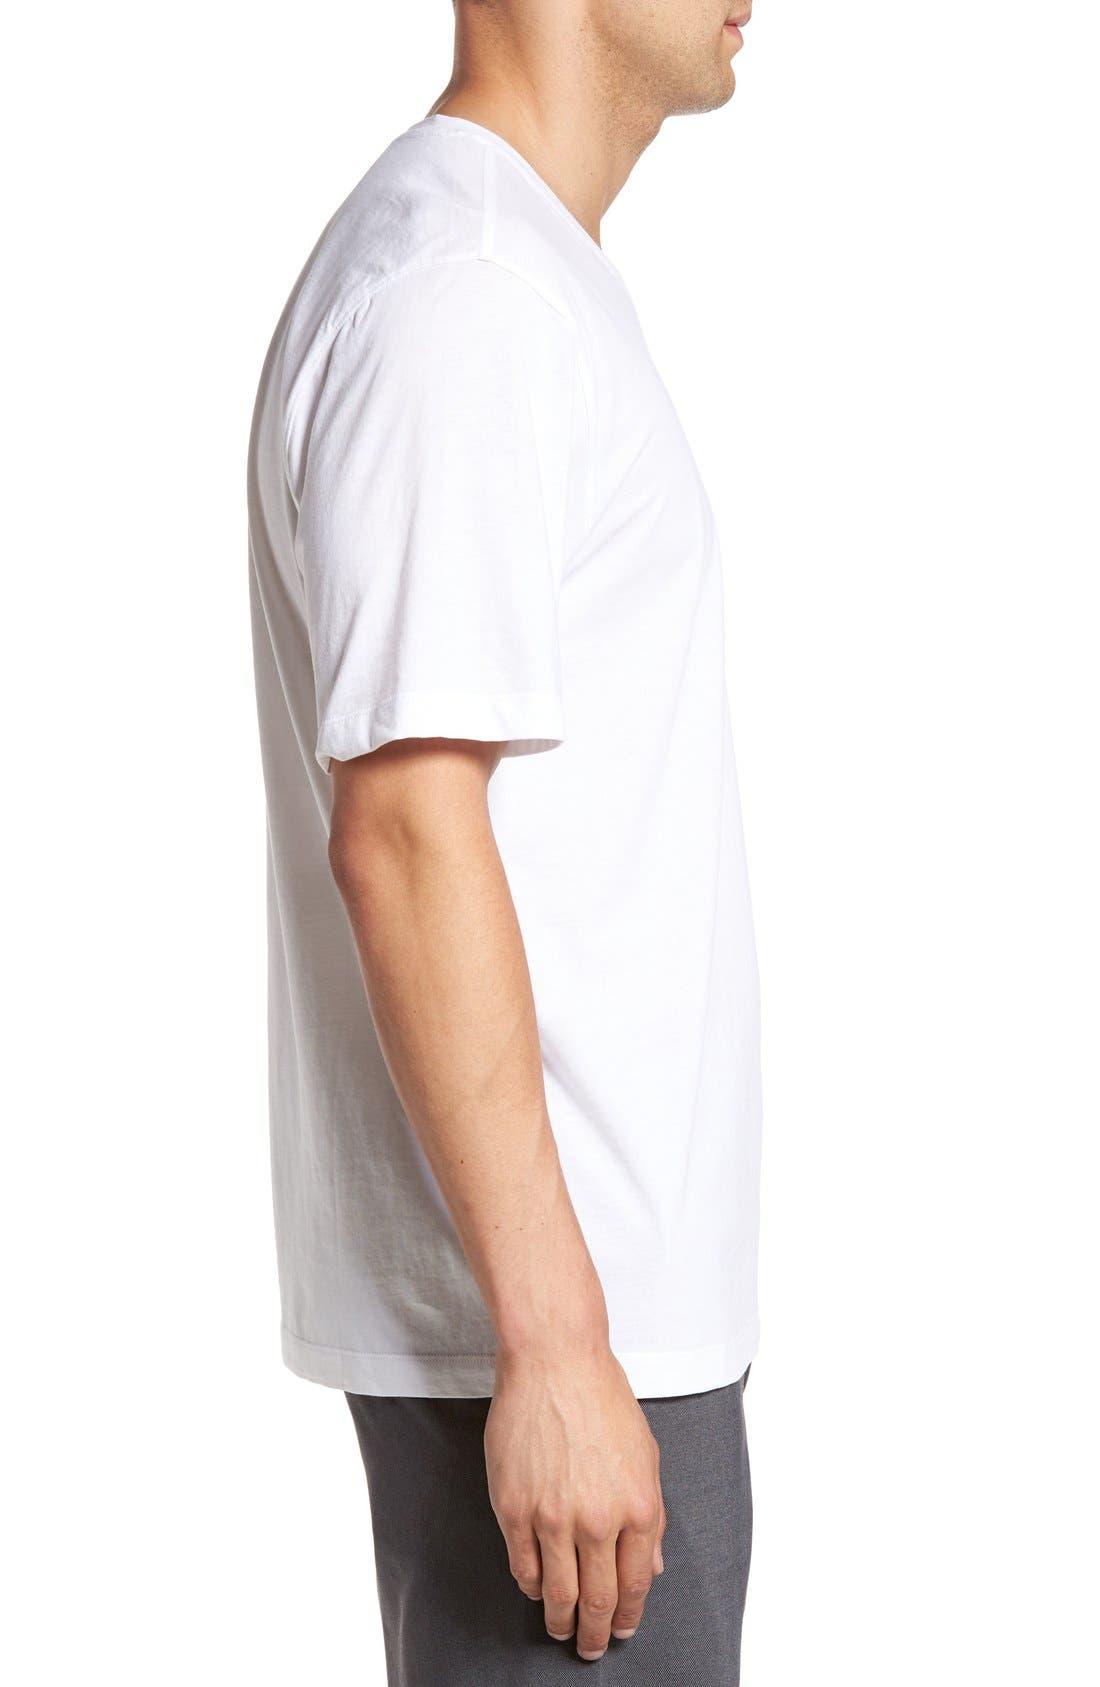 Alternate Image 3  - Cutter & Buck 'Sida' V-Neck T-Shirt (Big & Tall)